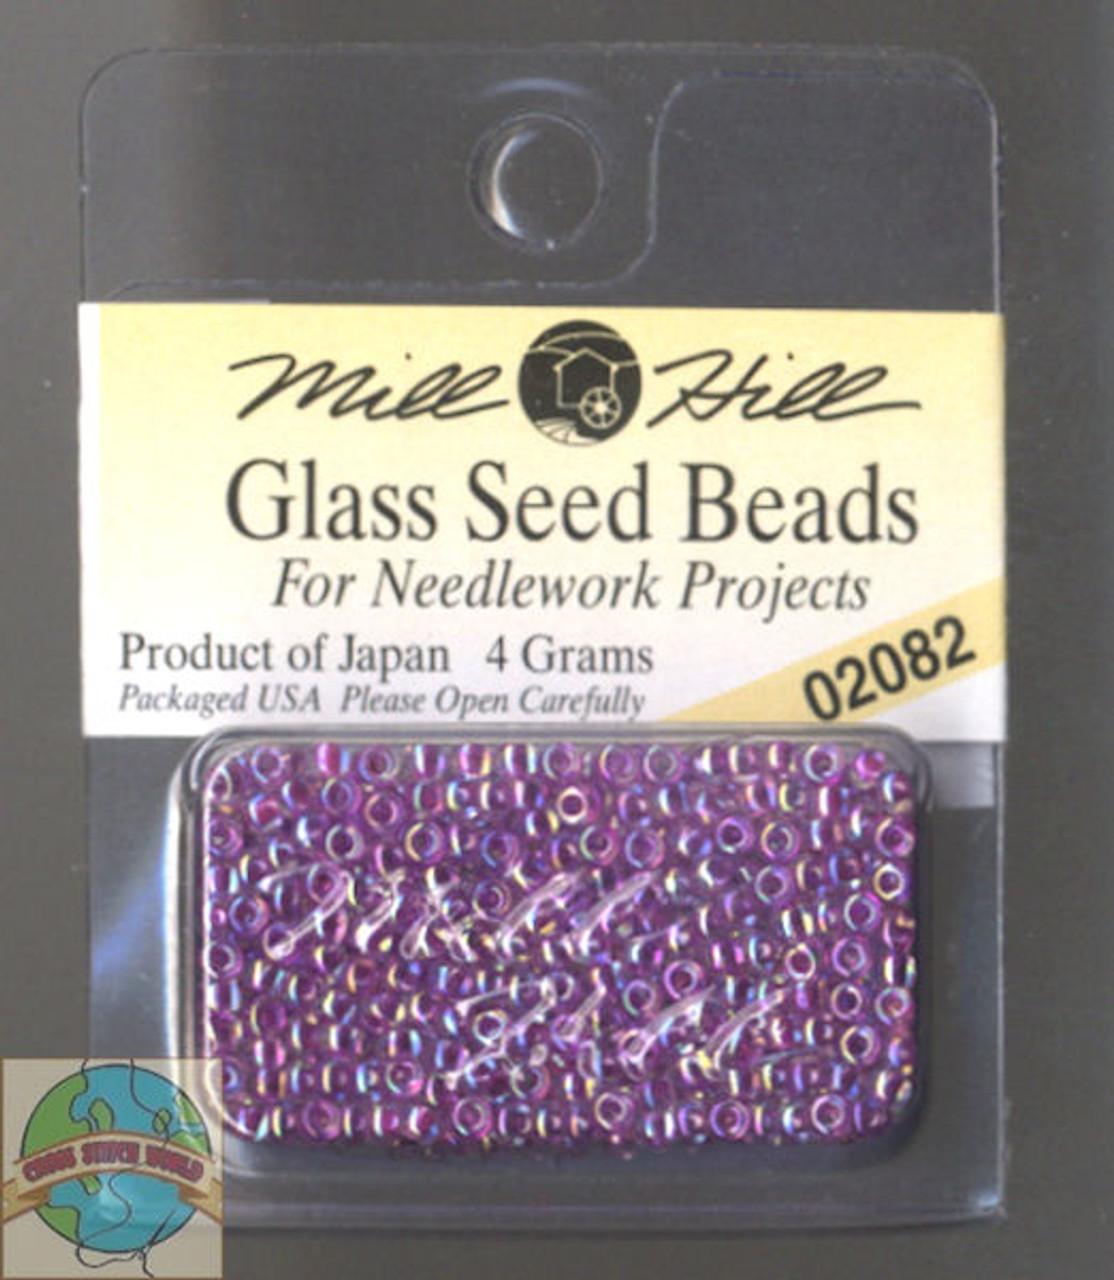 Mill Hill Glass Seed Beads 4g Opal Hyacinth #02082